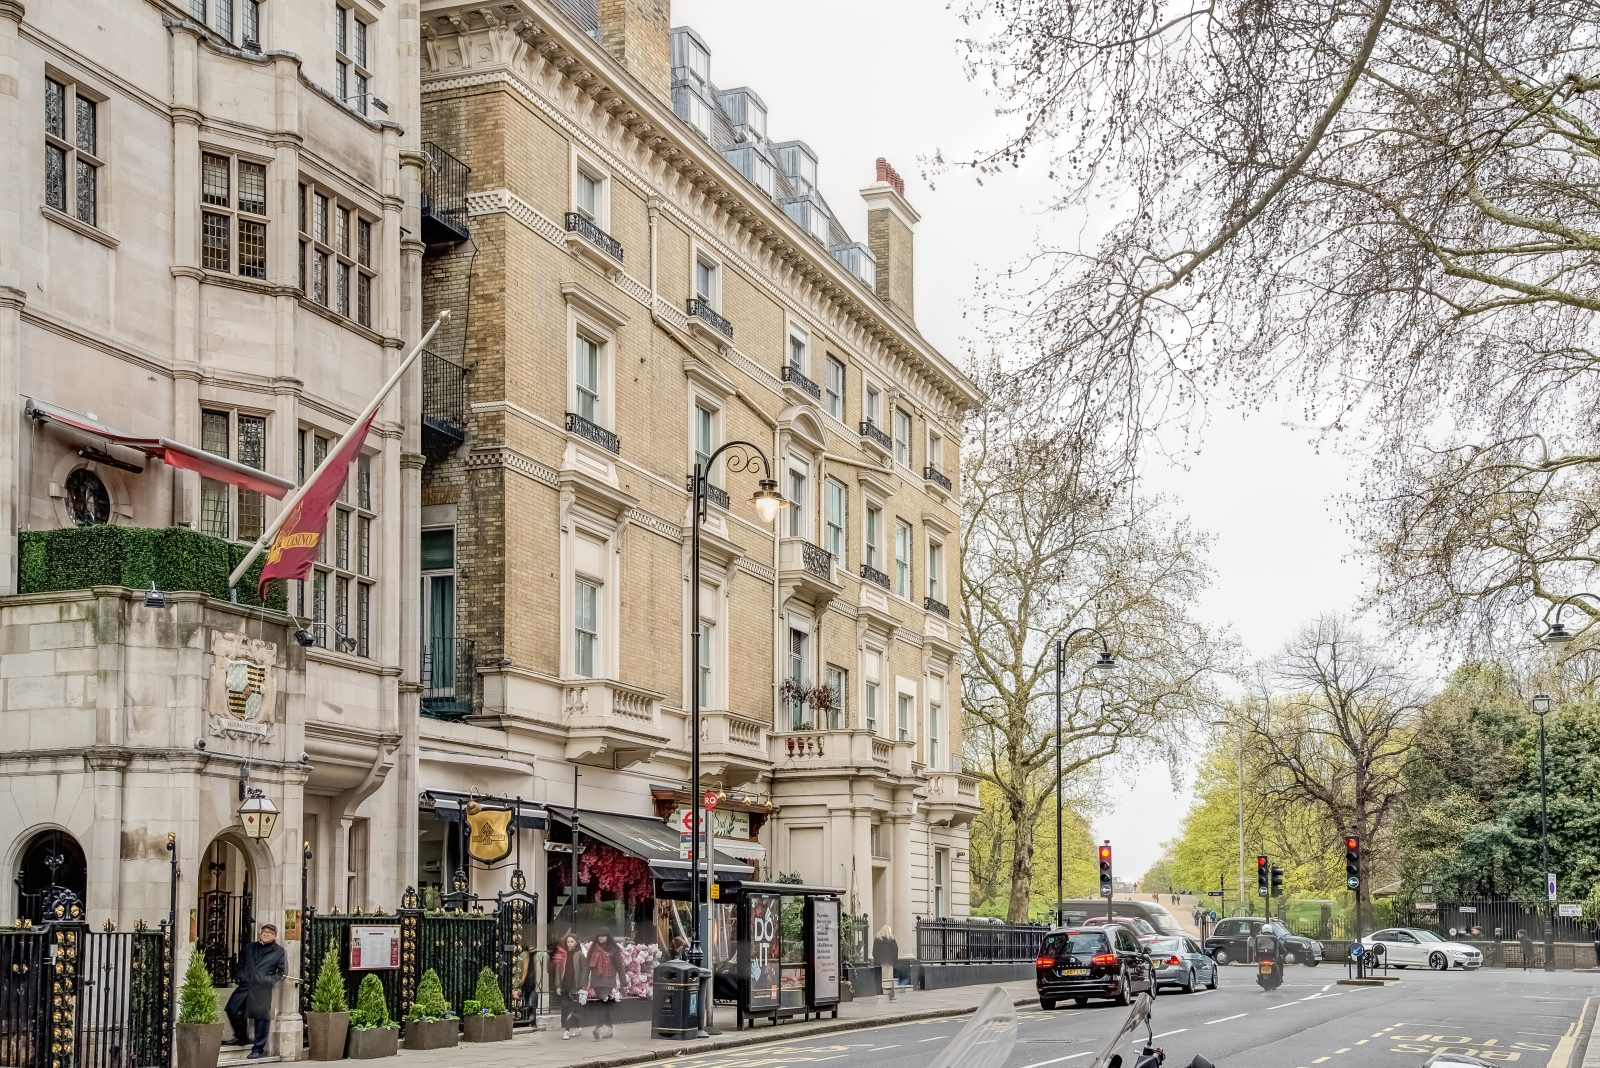 Kensington Gardens Apartment, exterior view